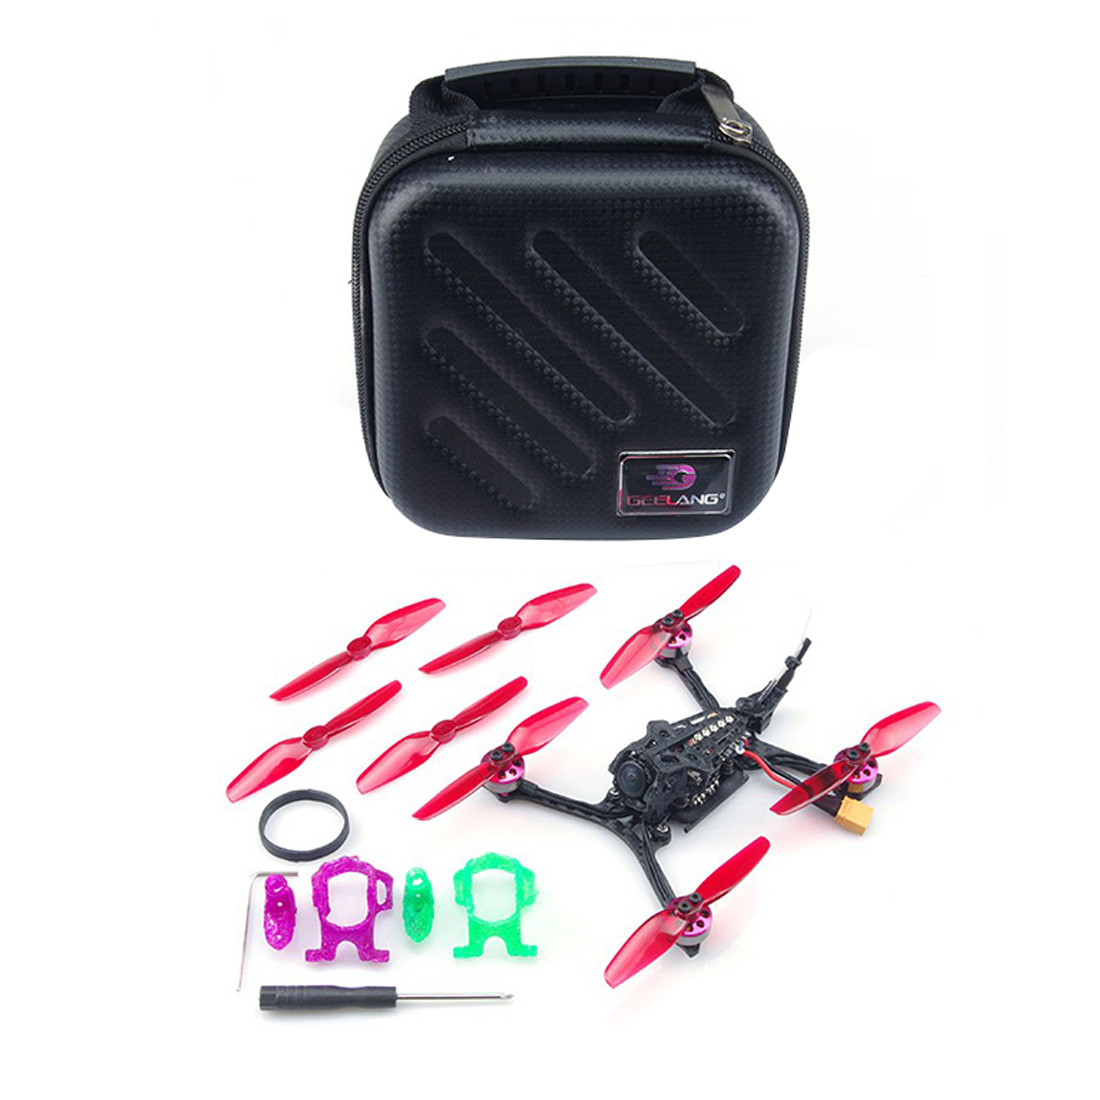 Geelang LIGHTNING 120X Bwhoop 120mm Wheelbase 2-3S FPV Racing Drone Quadcopter BNF/PNP GL1204 KV5000 Brushless